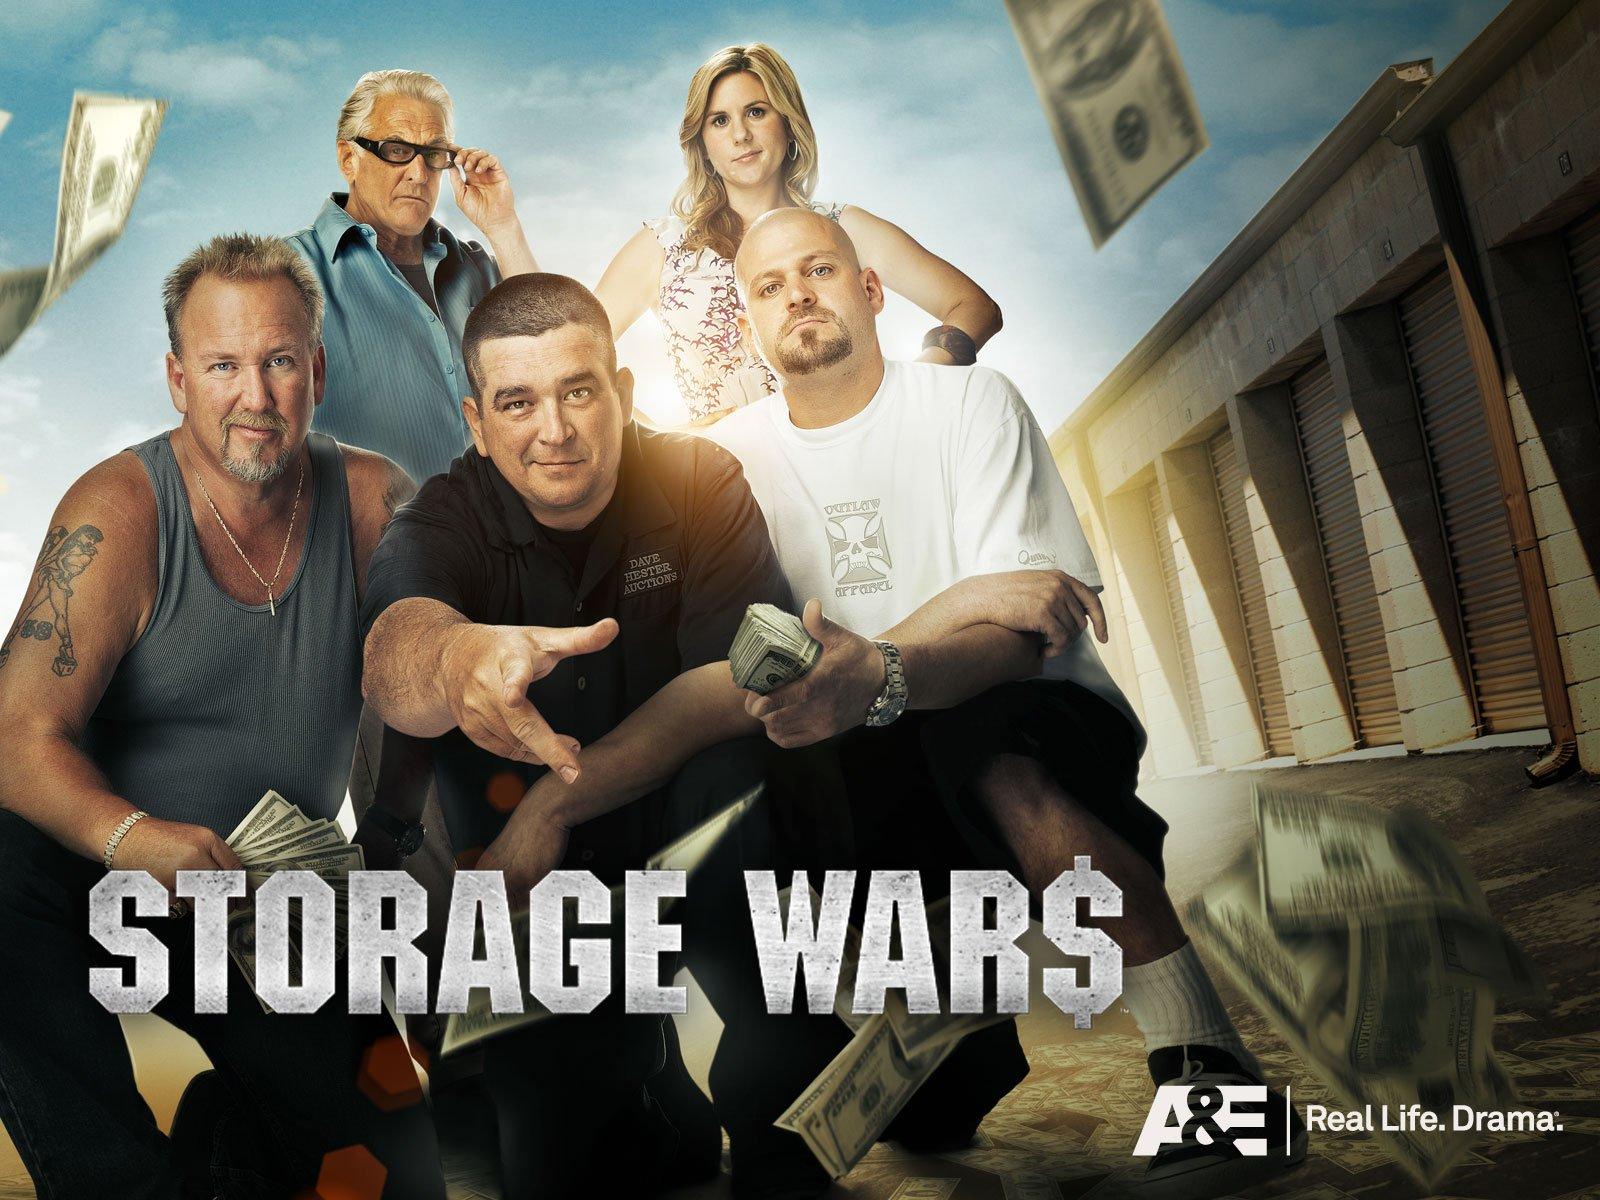 amazon com storage wars season 2 amazon digital services llc